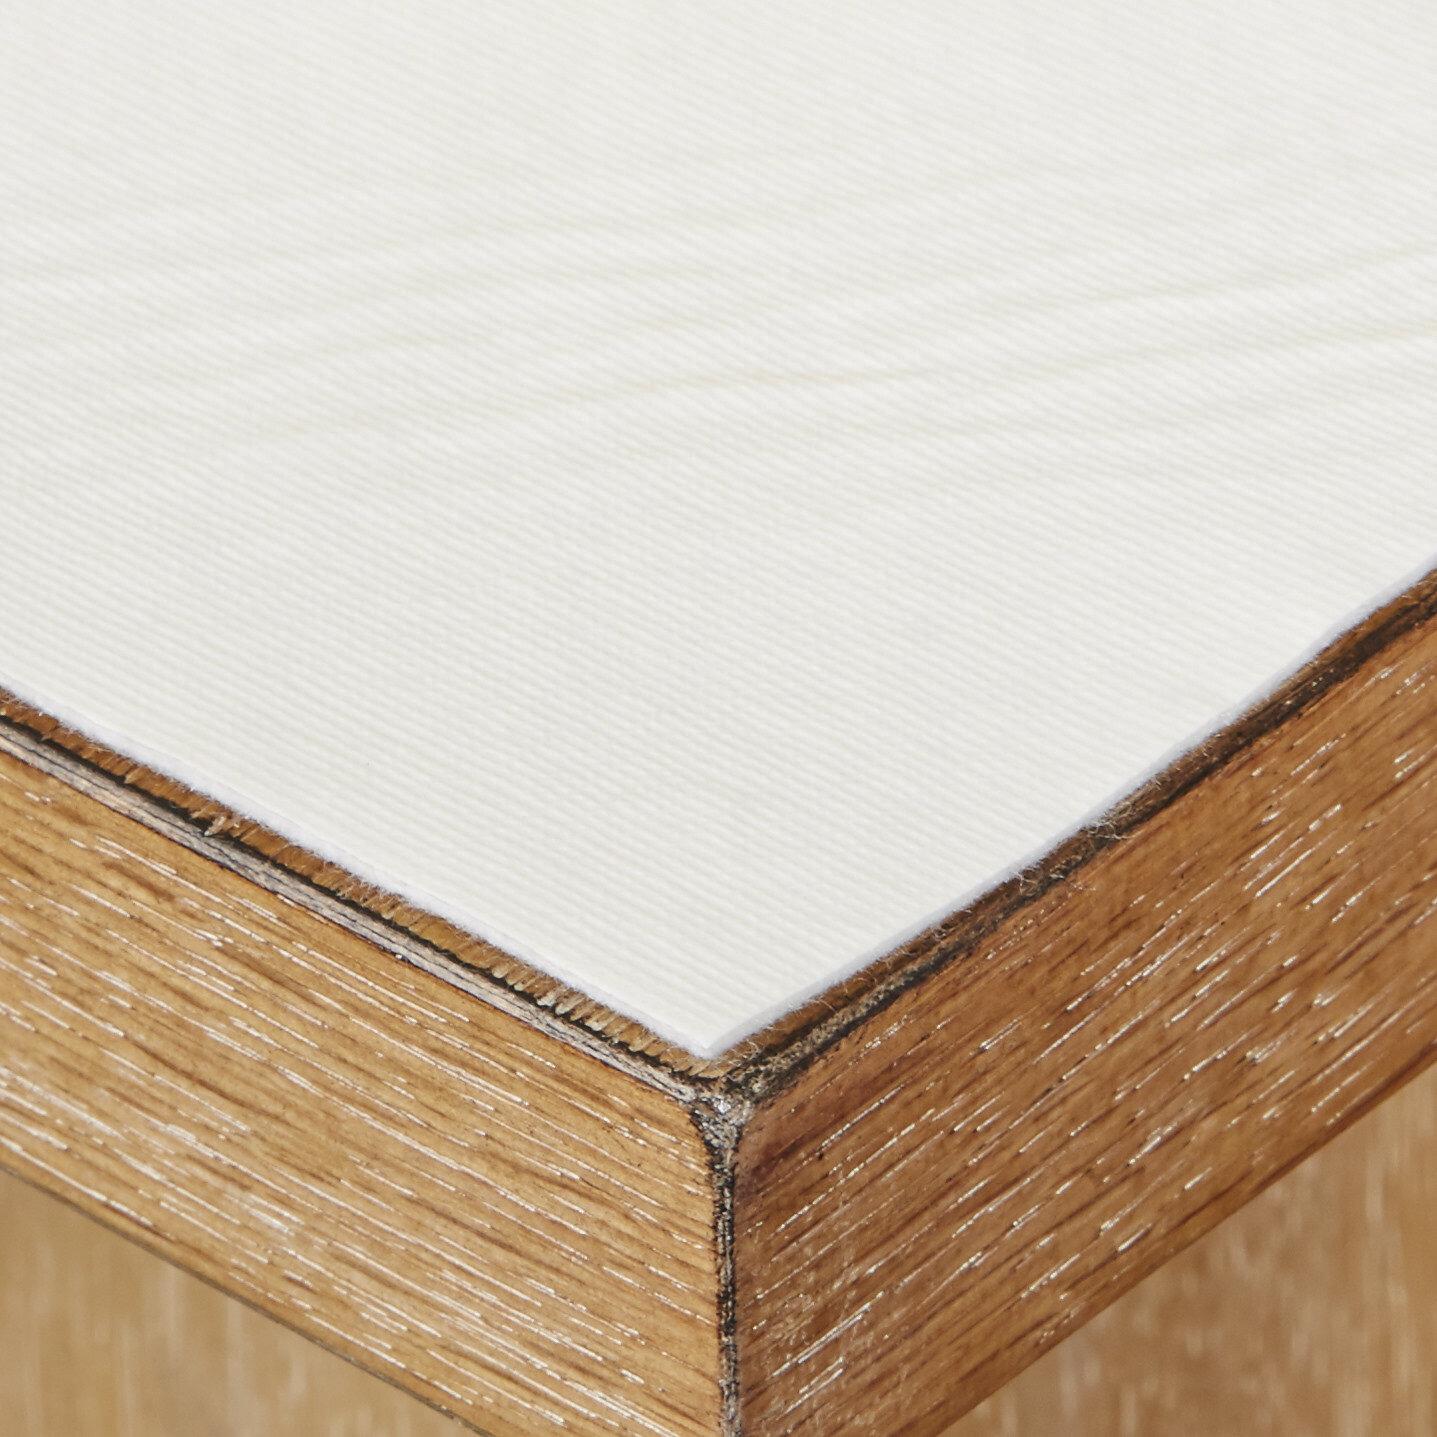 Dining Table Protector Pad Wayfair - Heatproof table pad